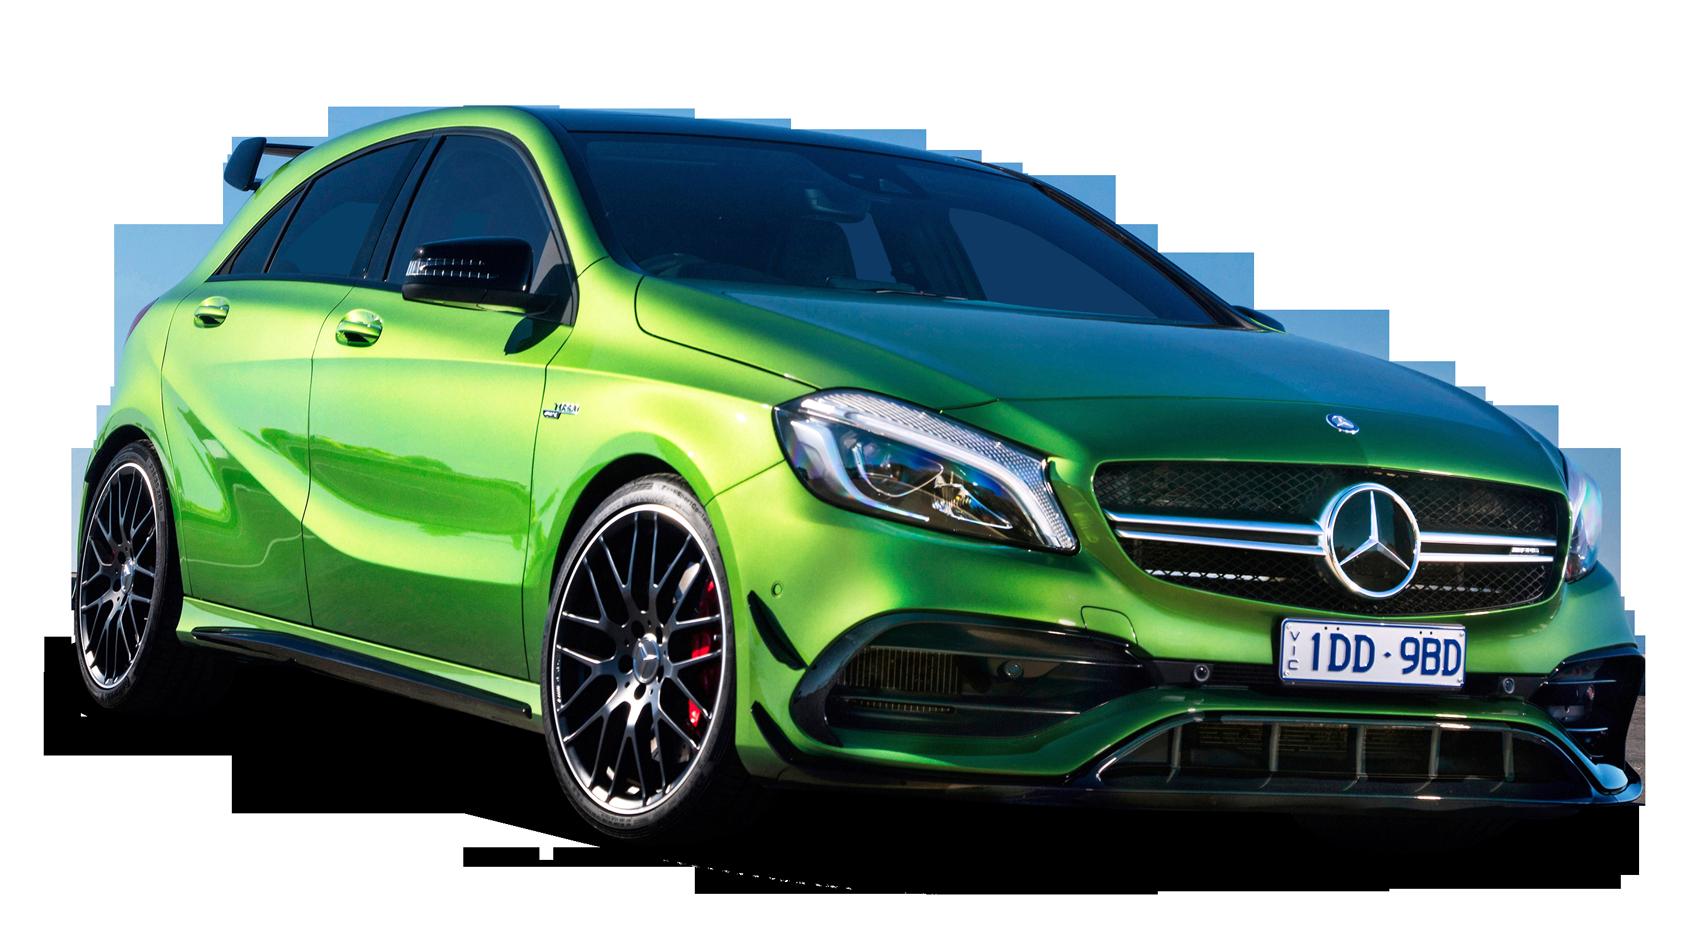 Mercedes Benz mercedes benz a class : Green Mercedes Benz A Class Car PNG Image - PurePNG | Free CC0 PNG ...